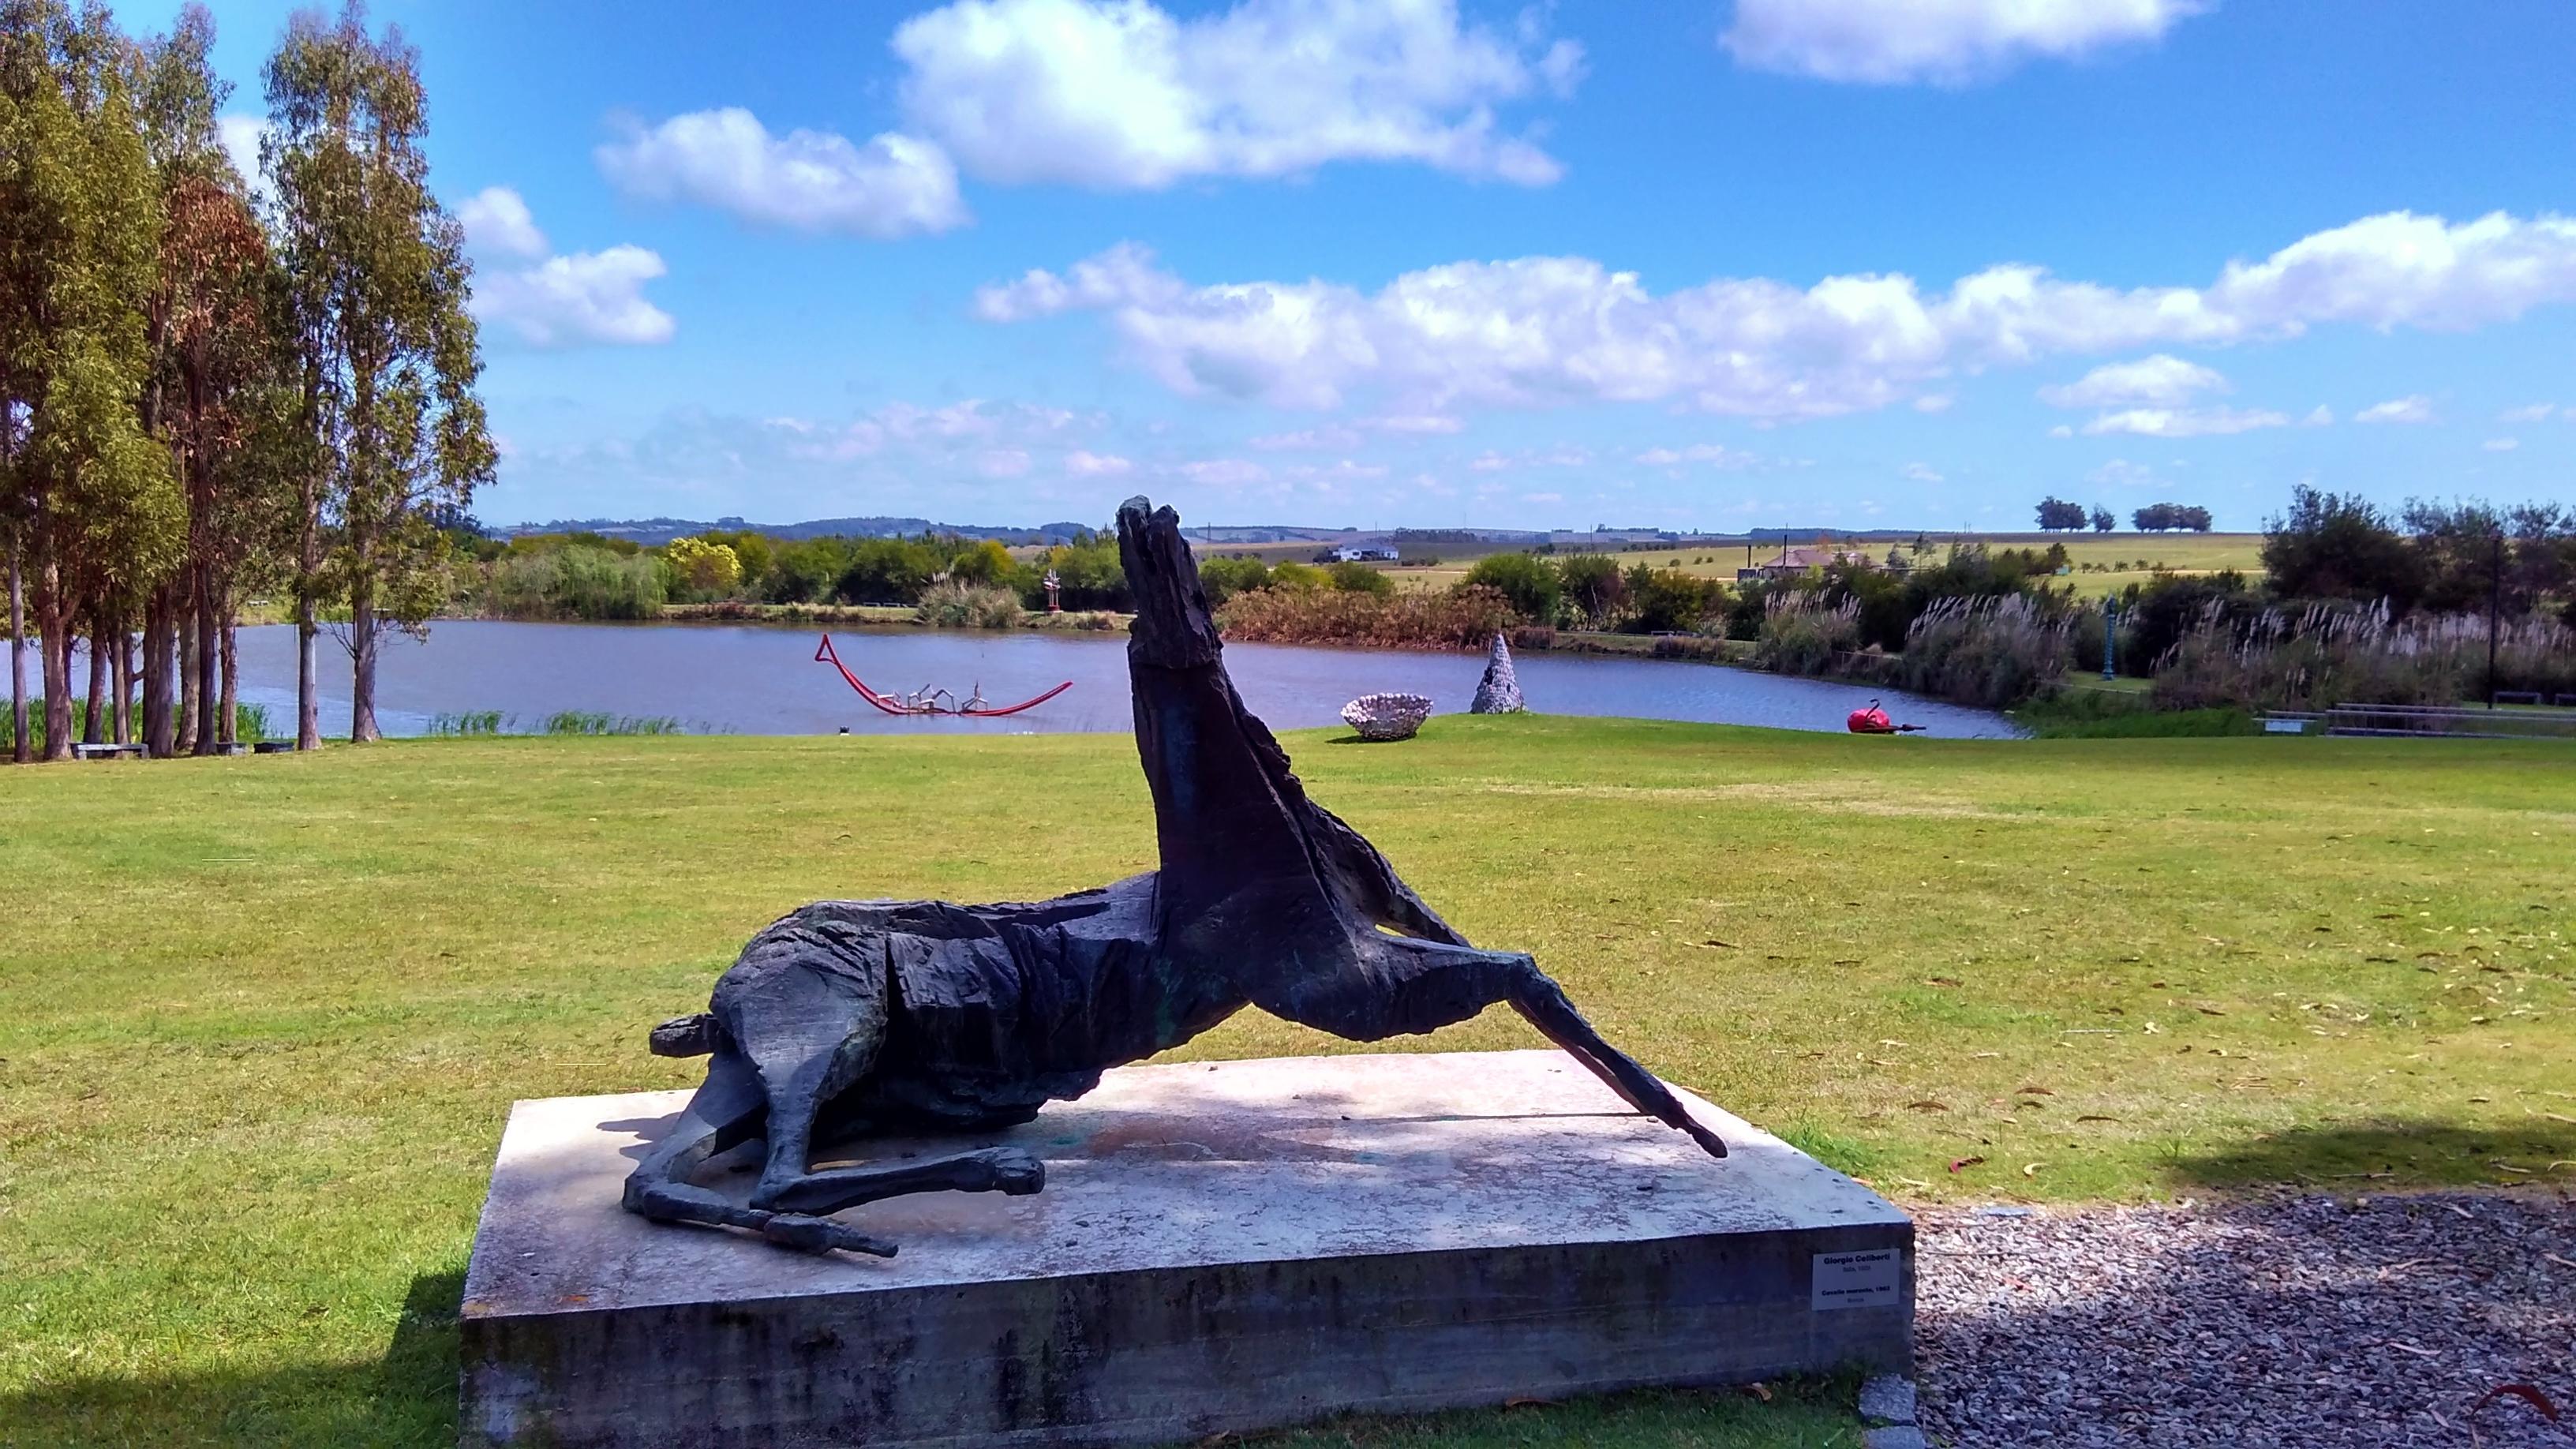 Parque das esculturas no Uruguai